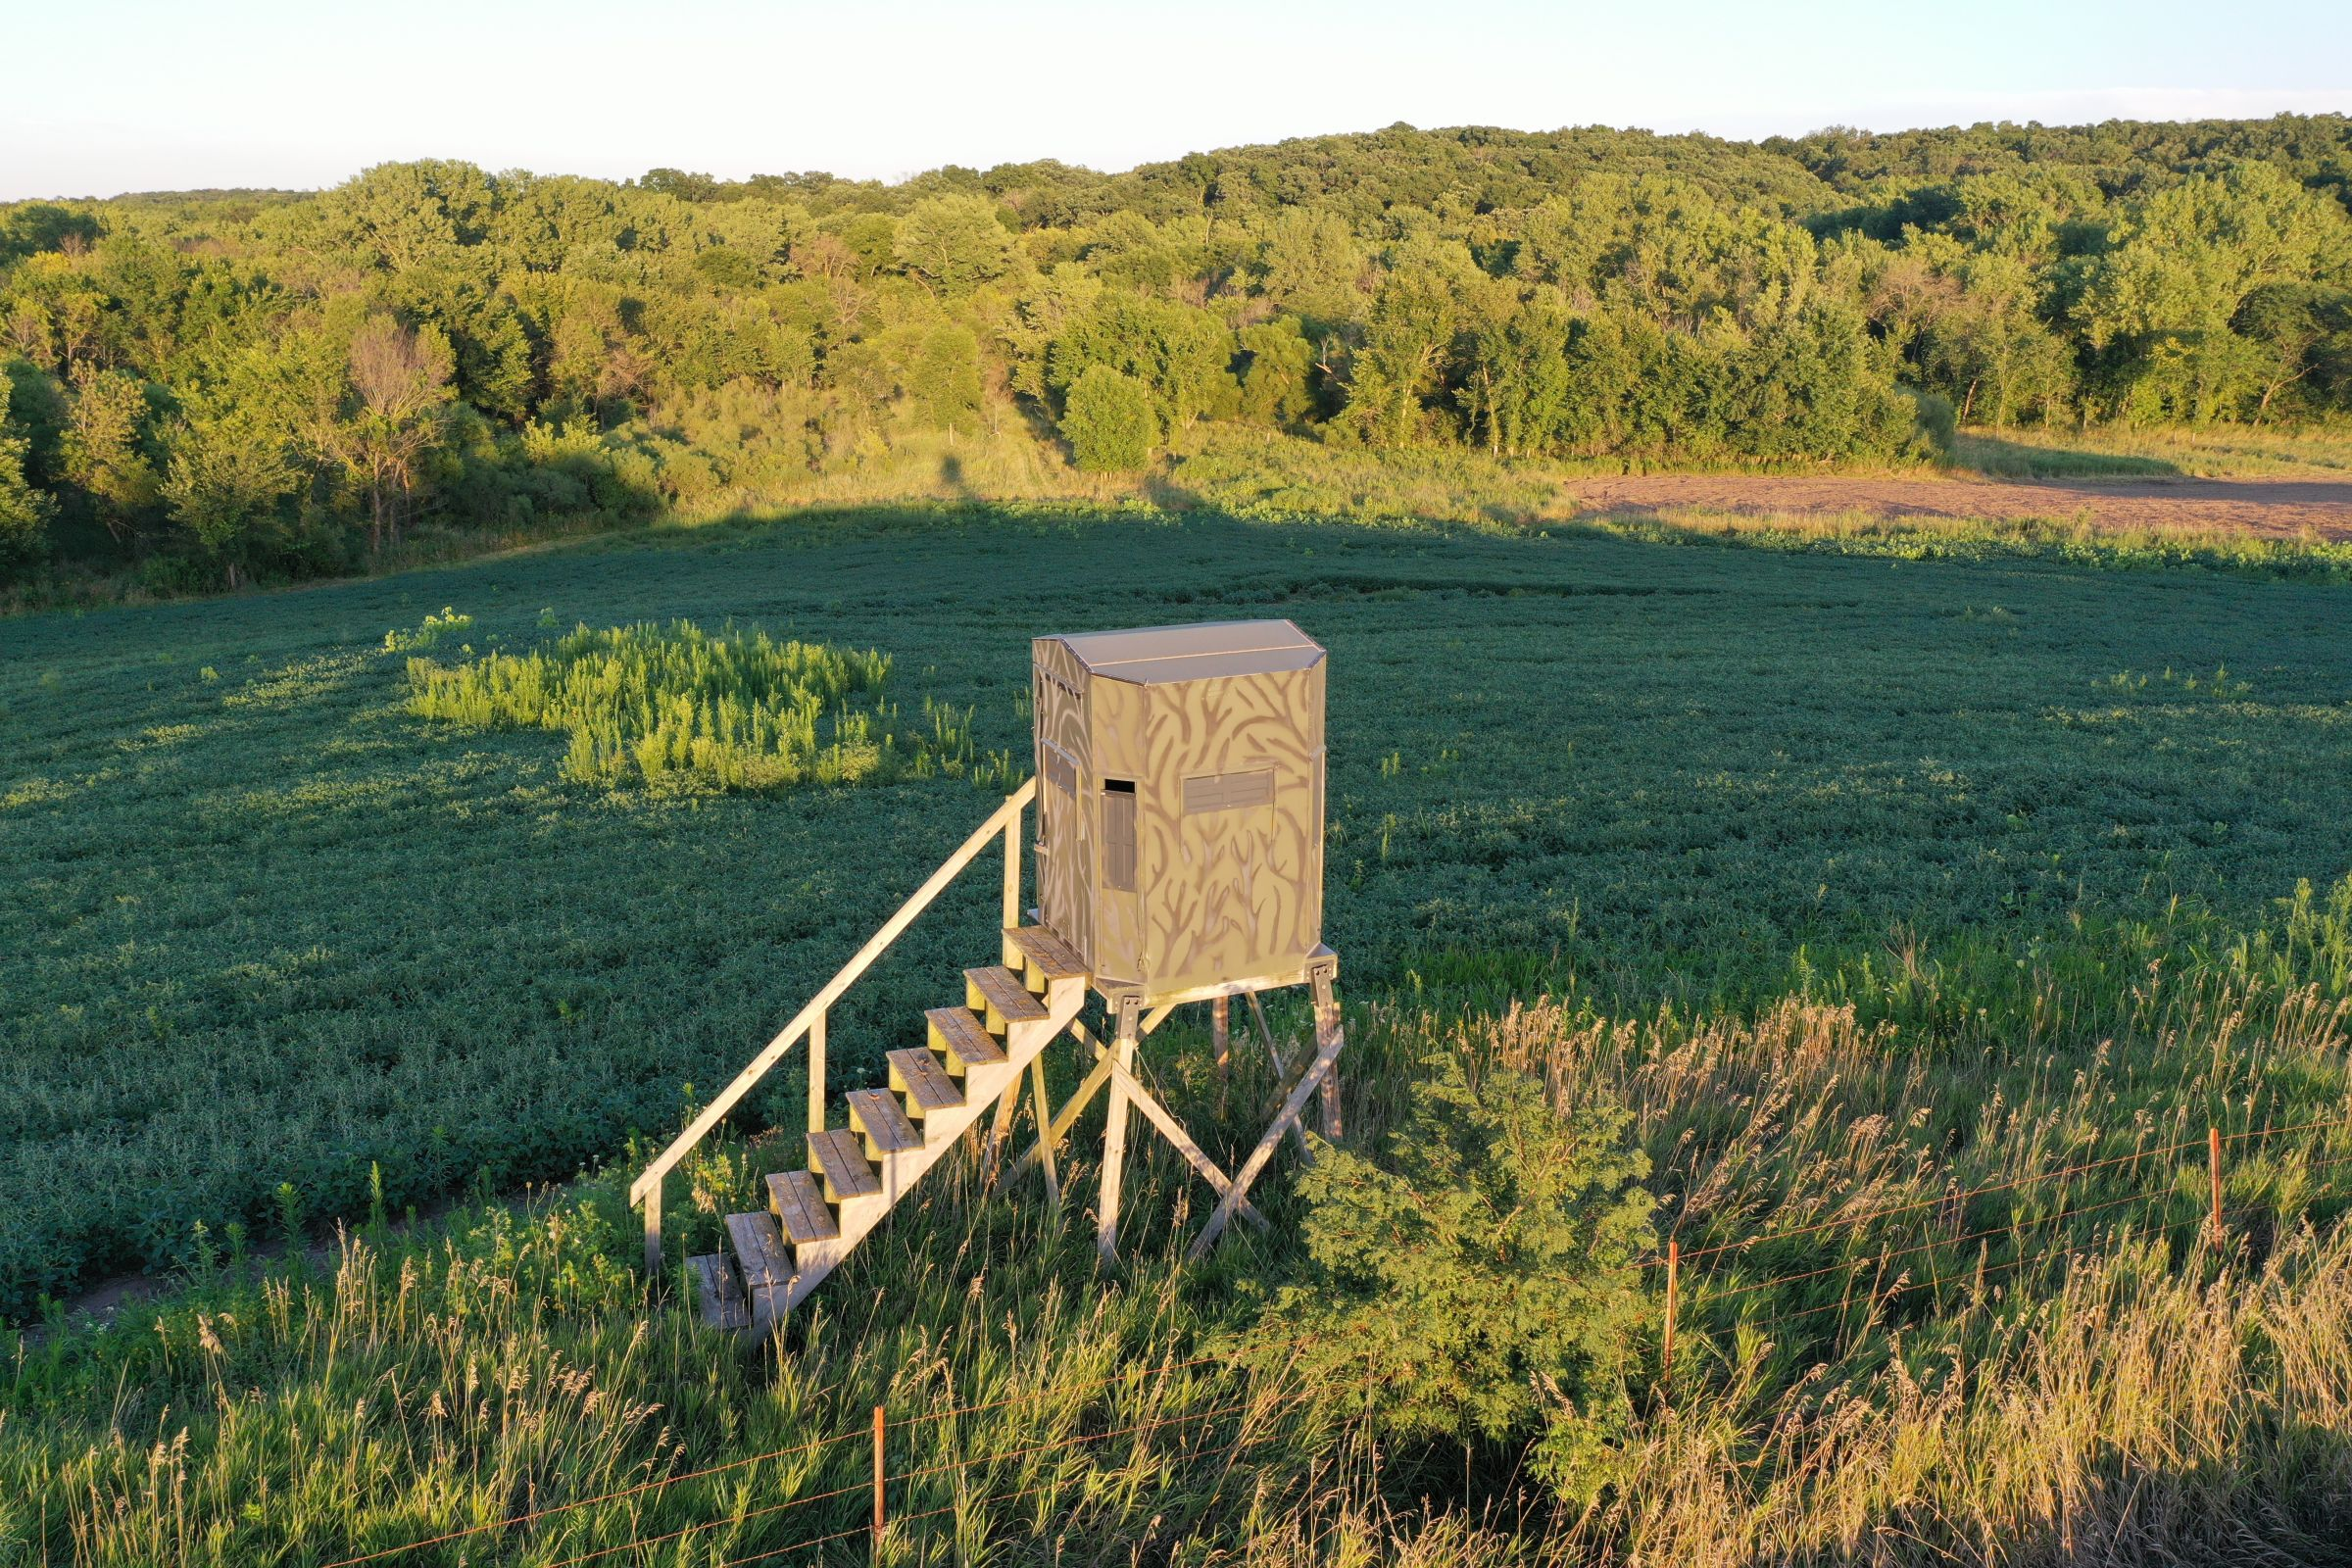 land-clarke-county-iowa-325-acres-listing-number-15416-0-2021-03-19-165301.JPG